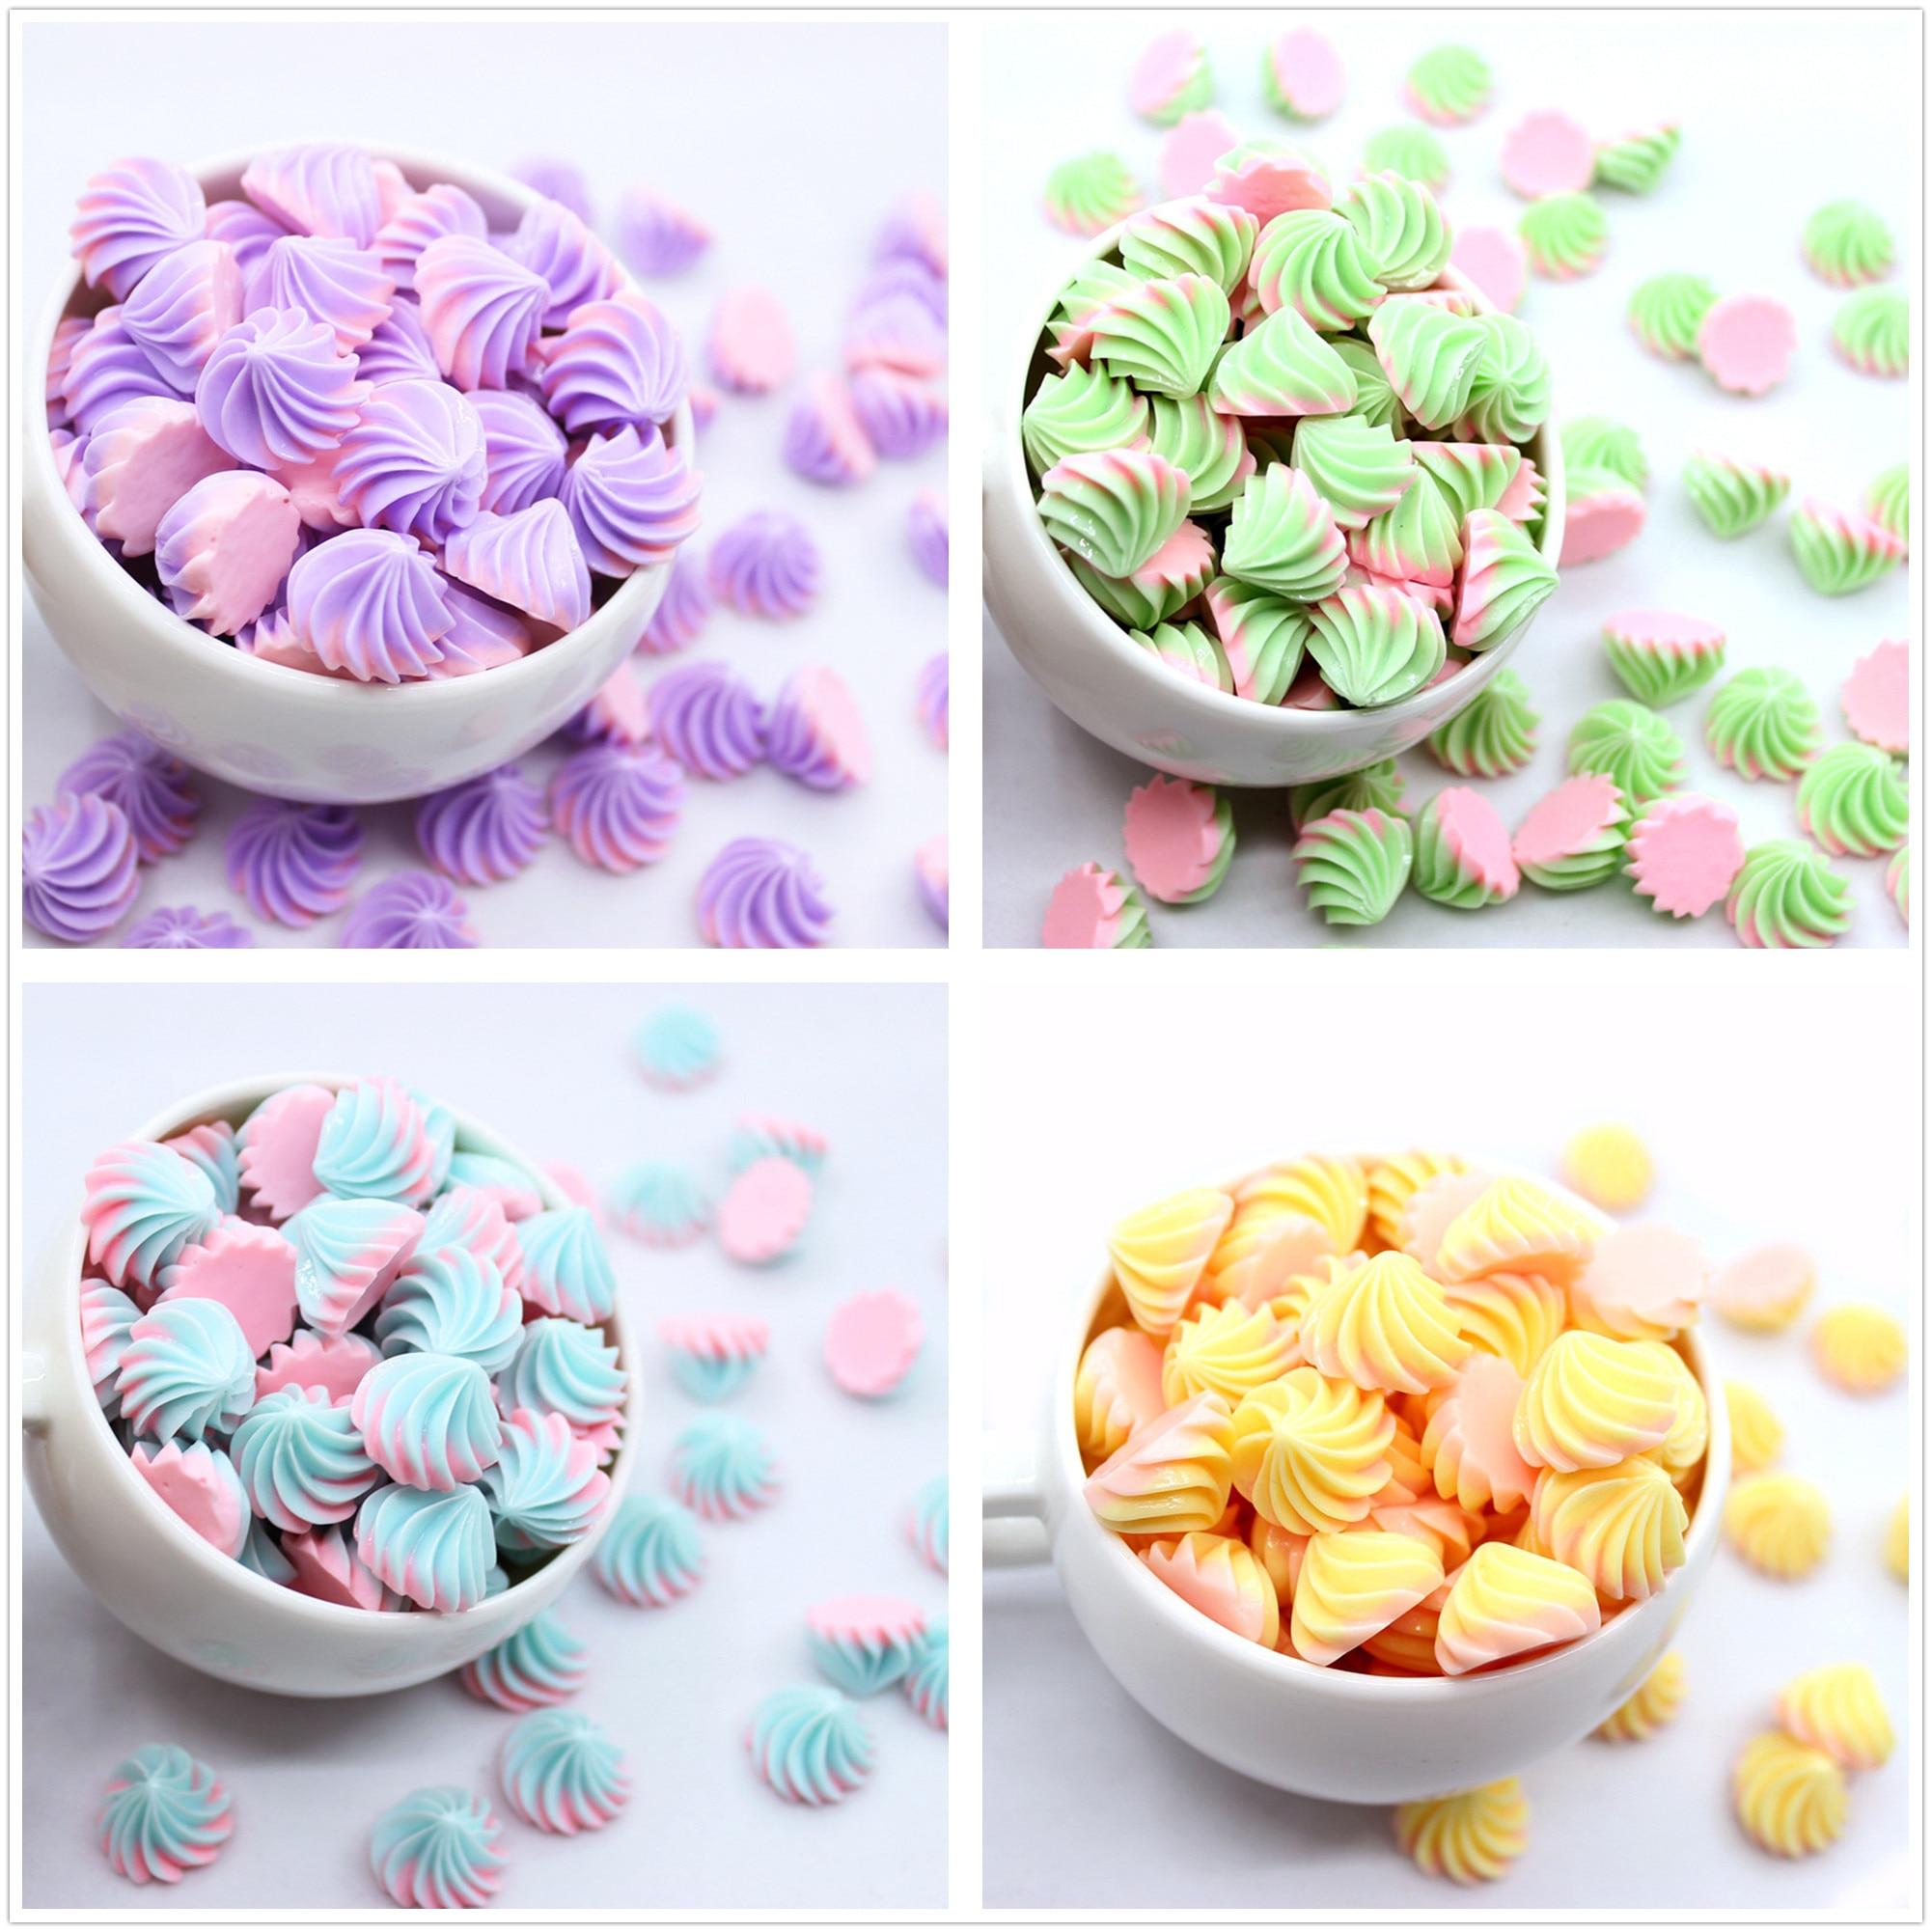 10pcs Mini Sugar Sweet Candy Biscuit Dollhouse Miniature Kitchen Toy Decoration